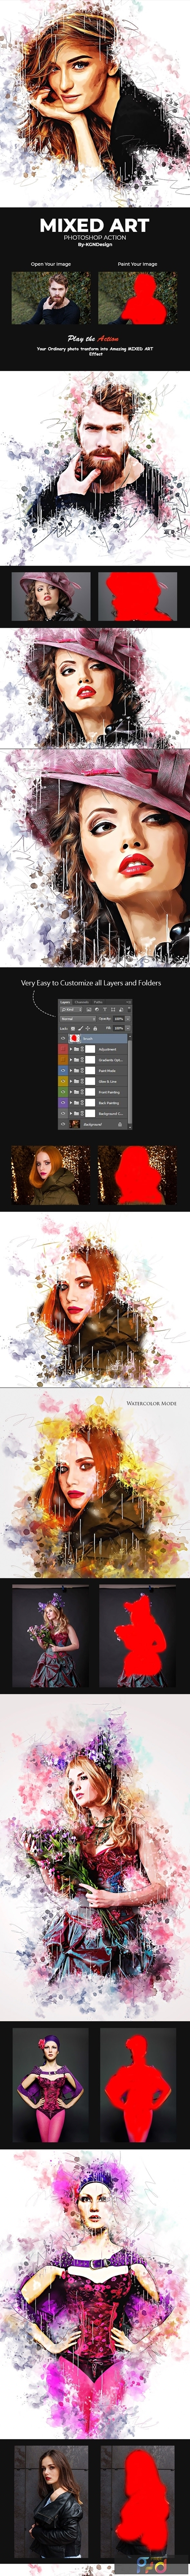 Mixed Art Photoshop Action 22475807 1